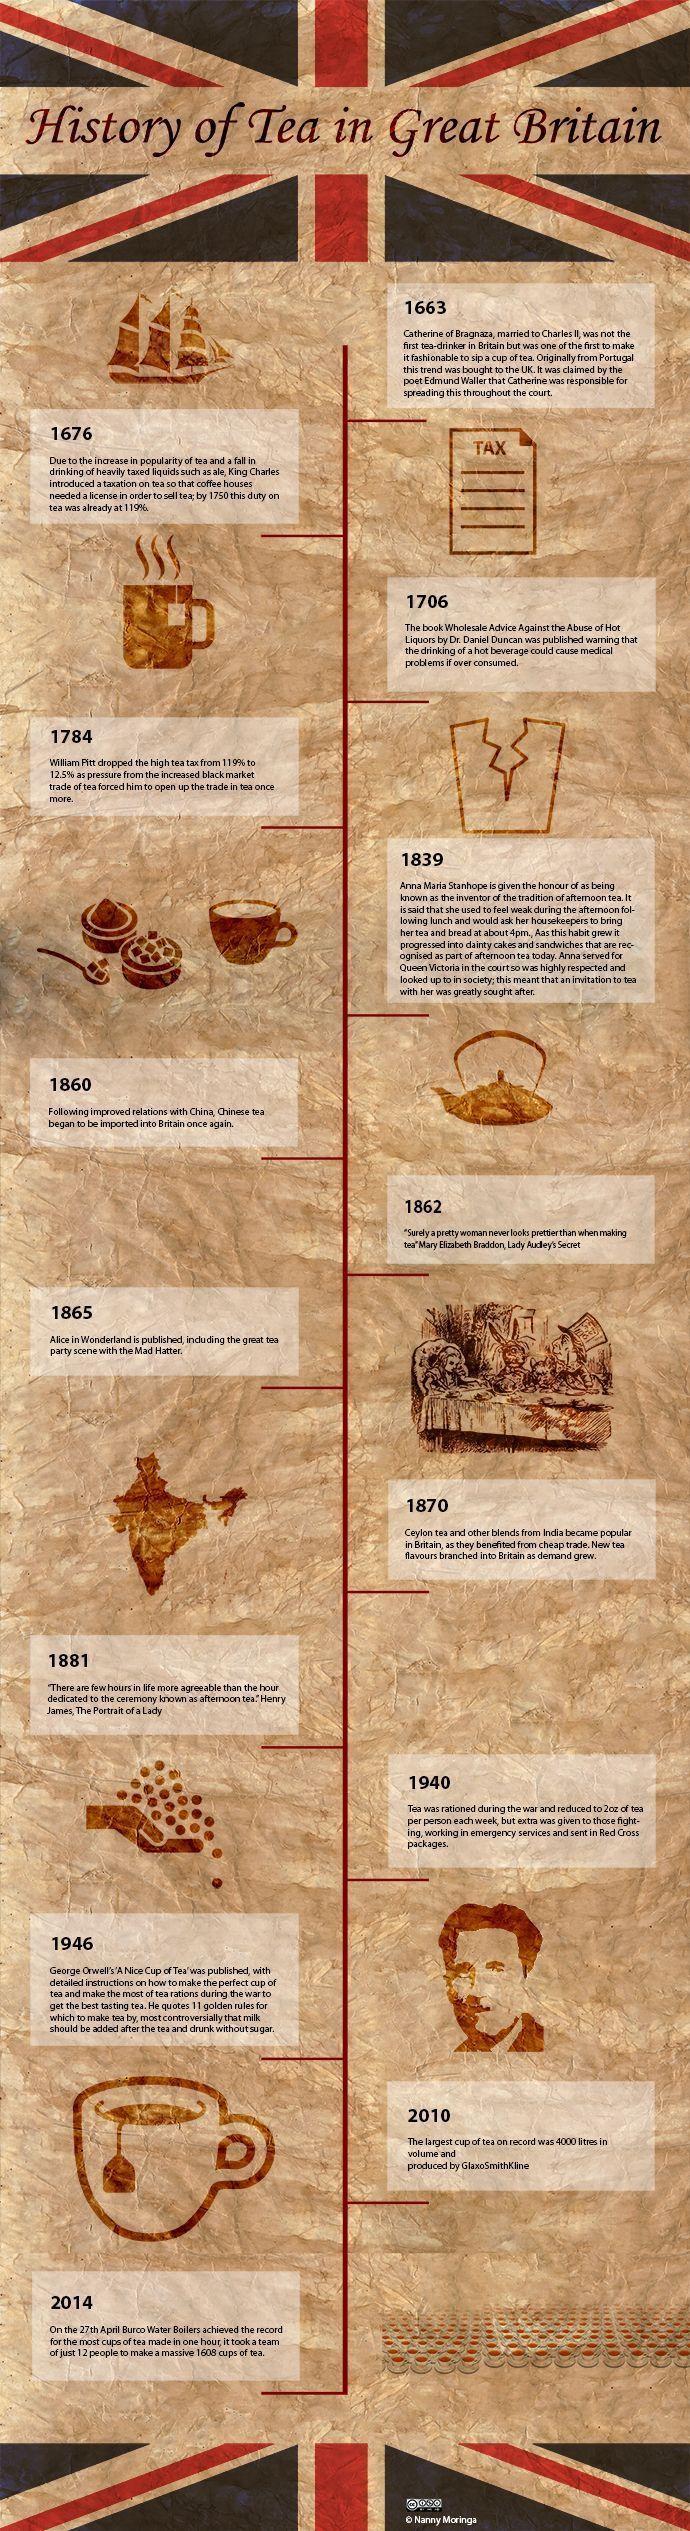 History of Tea in Great Britian http://www.afternoontea.co.uk: http://www.afternoontea.co.ukblog/the-afternoonteacouk-team/history-of-tea-in-great-britain/?utm_content=bufferb2117&utm_medium=social&utm_source=pinterest.com&utm_campaign=buffer